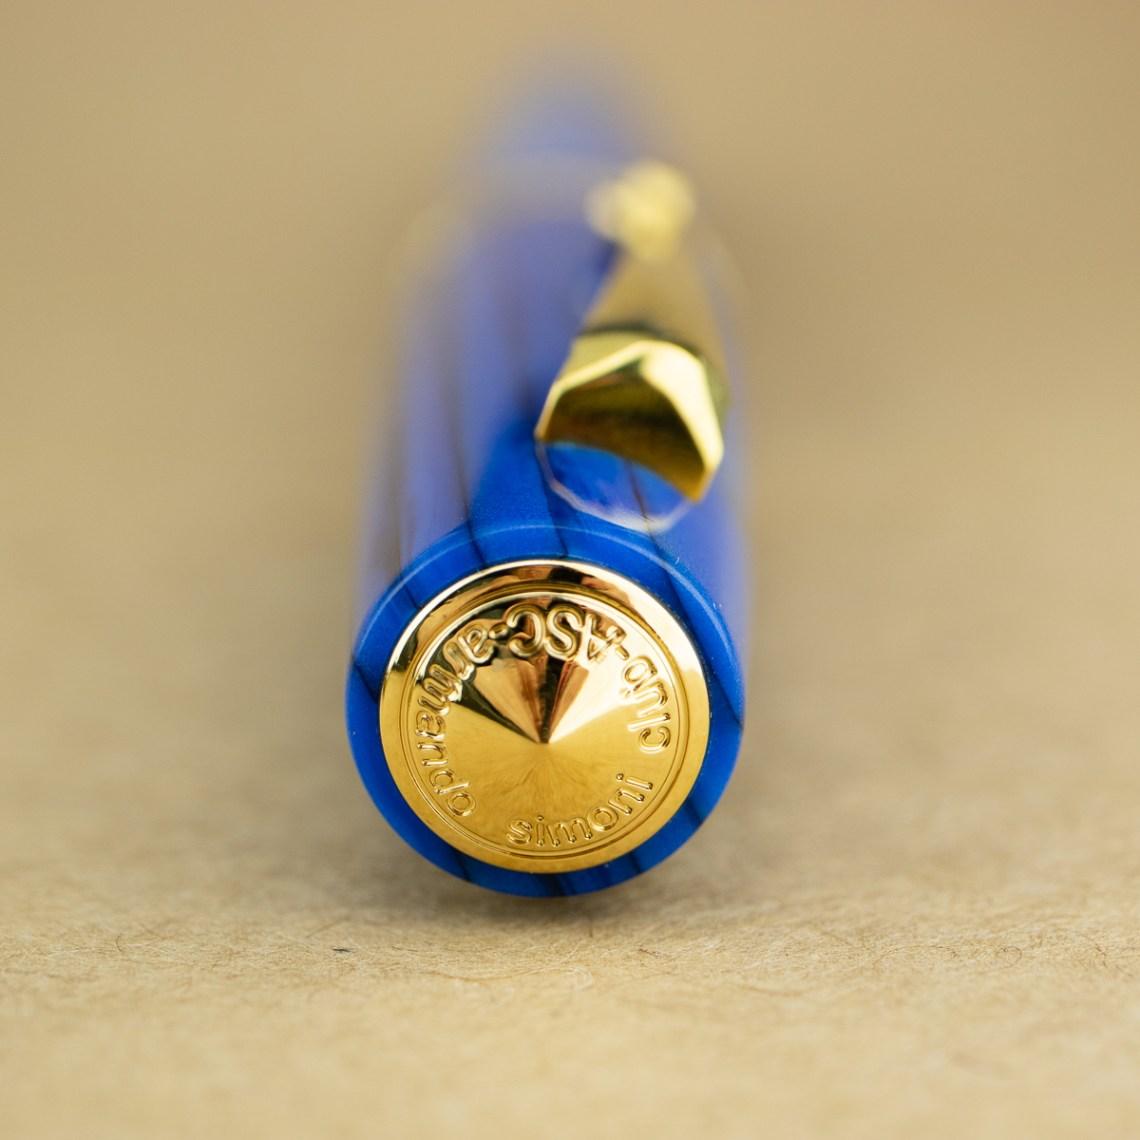 ASC Studio Pens Blue Pinnacle